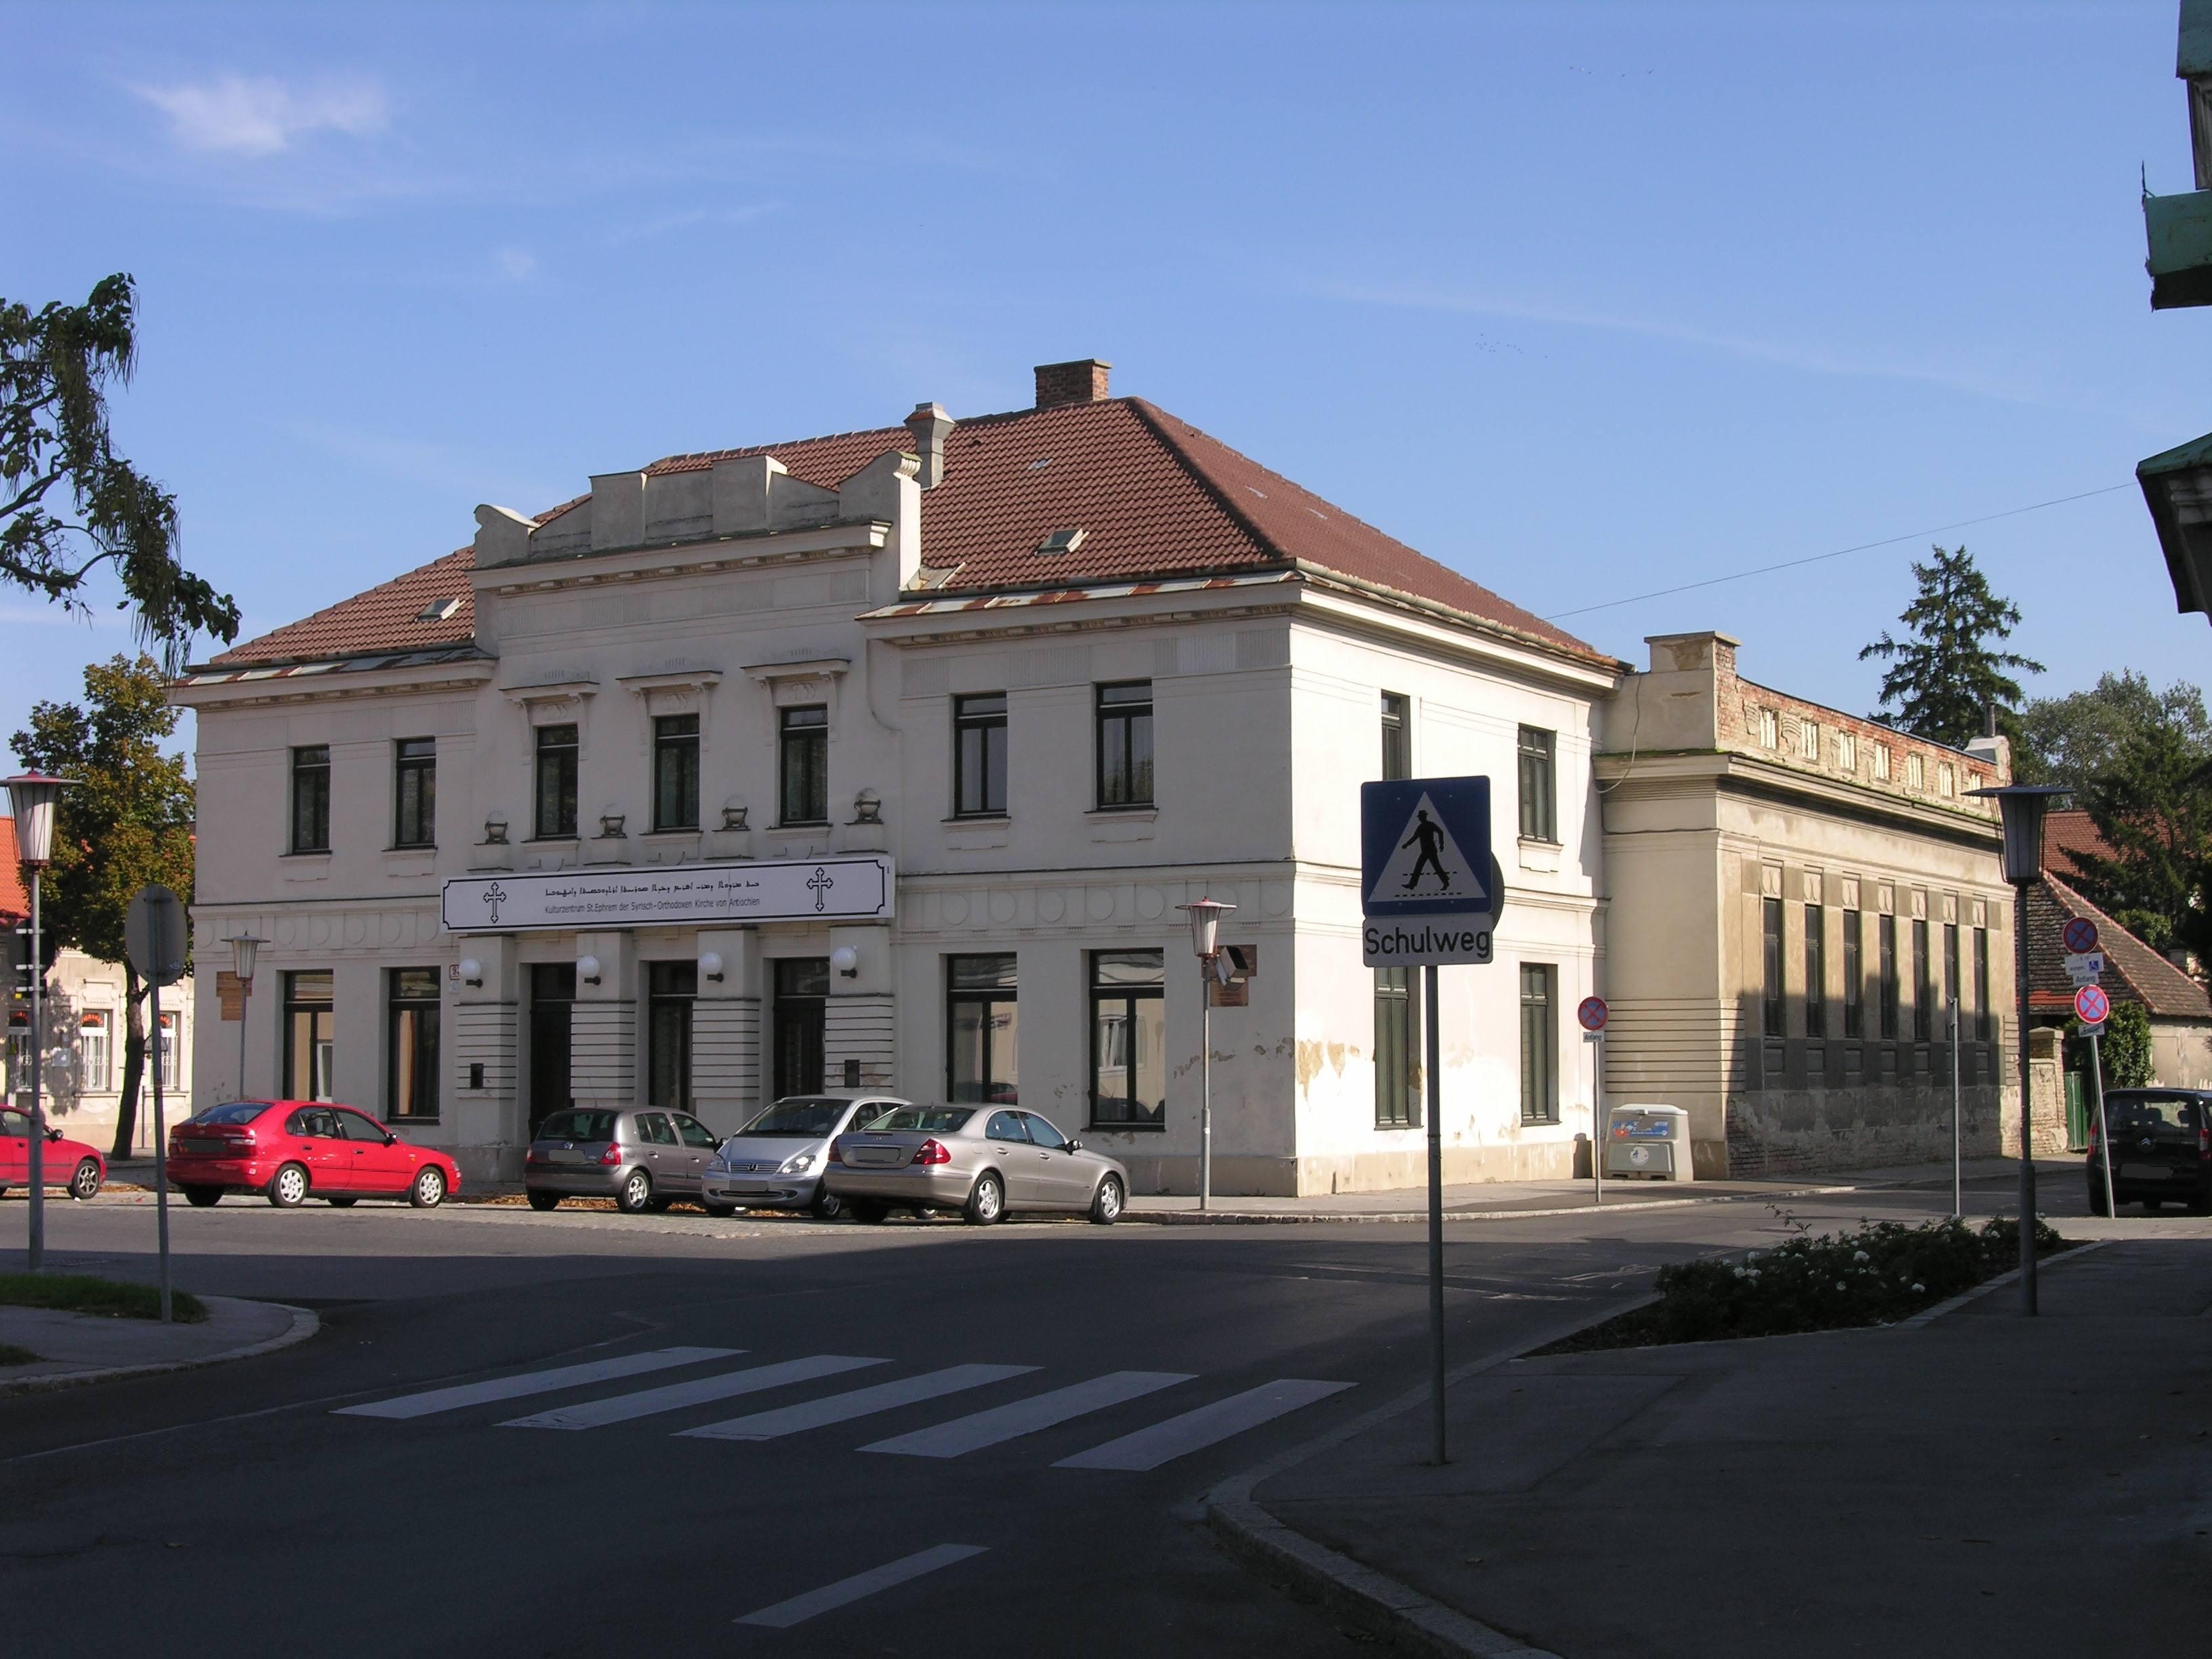 1210_Leopoldauer Platz 93